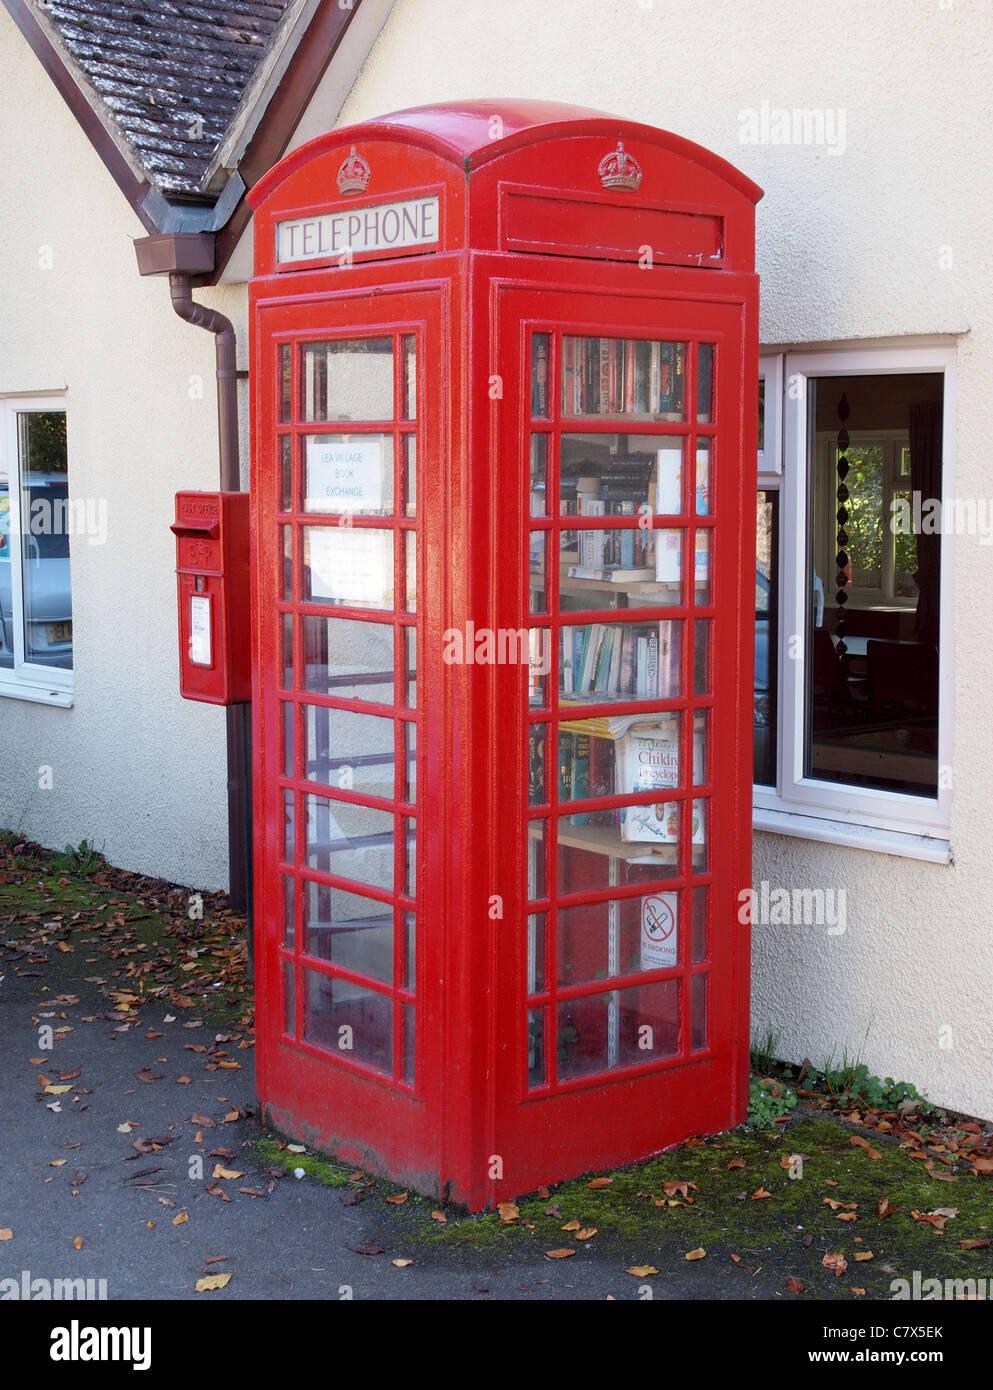 Book Exchange, Lea Wiltshire - Stock Image